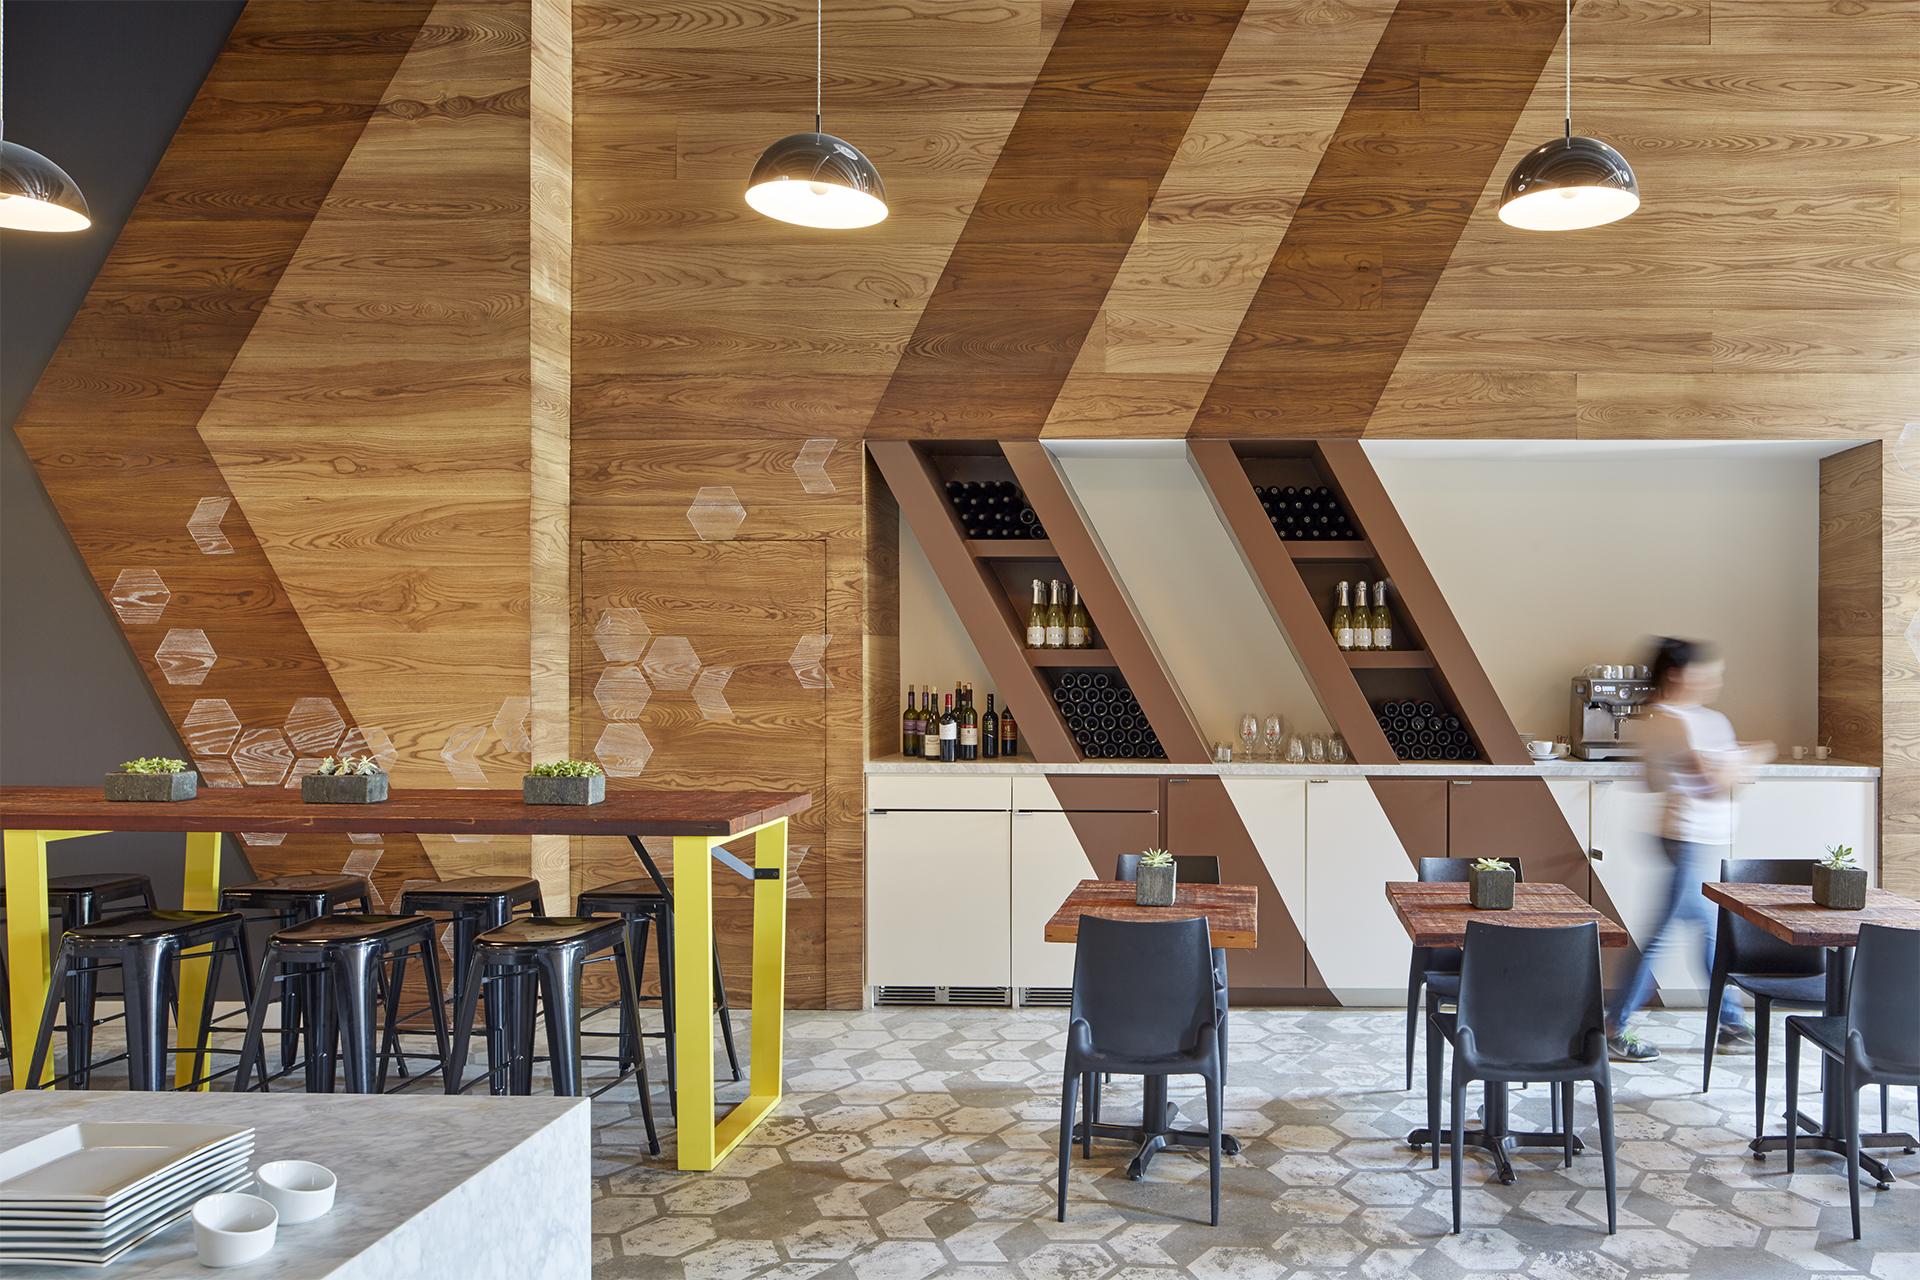 belzberg-architects-Prova-Pizzeria-105.jpg